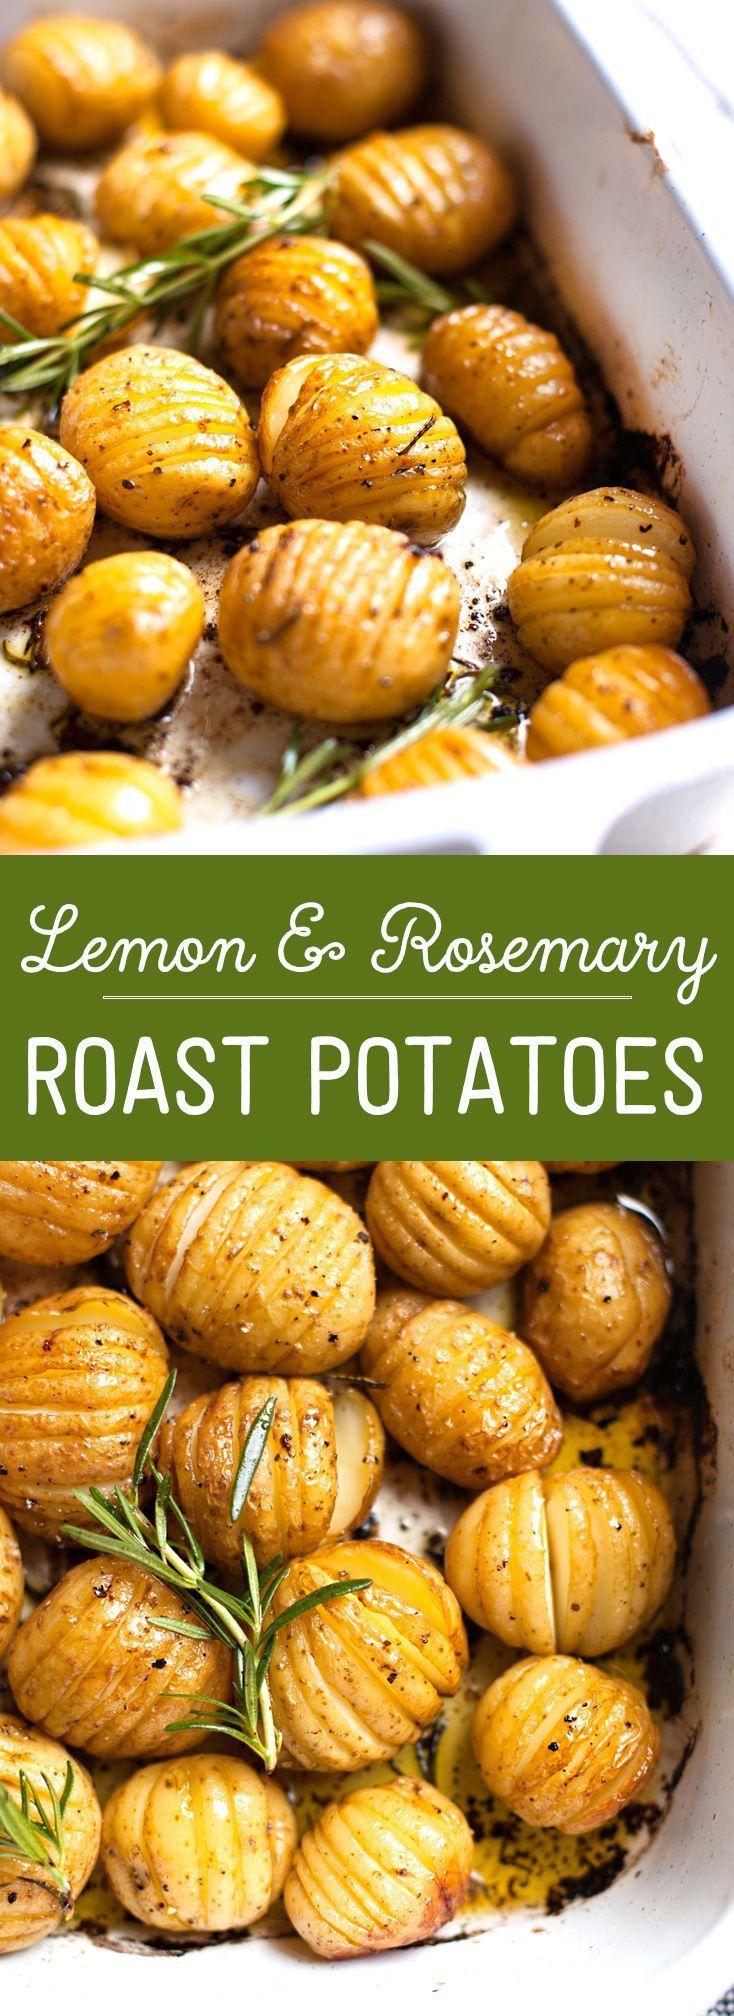 Lemon and Rosemary Roast Potatoes Rosemary and Lemon Roasted Baby Potatoes